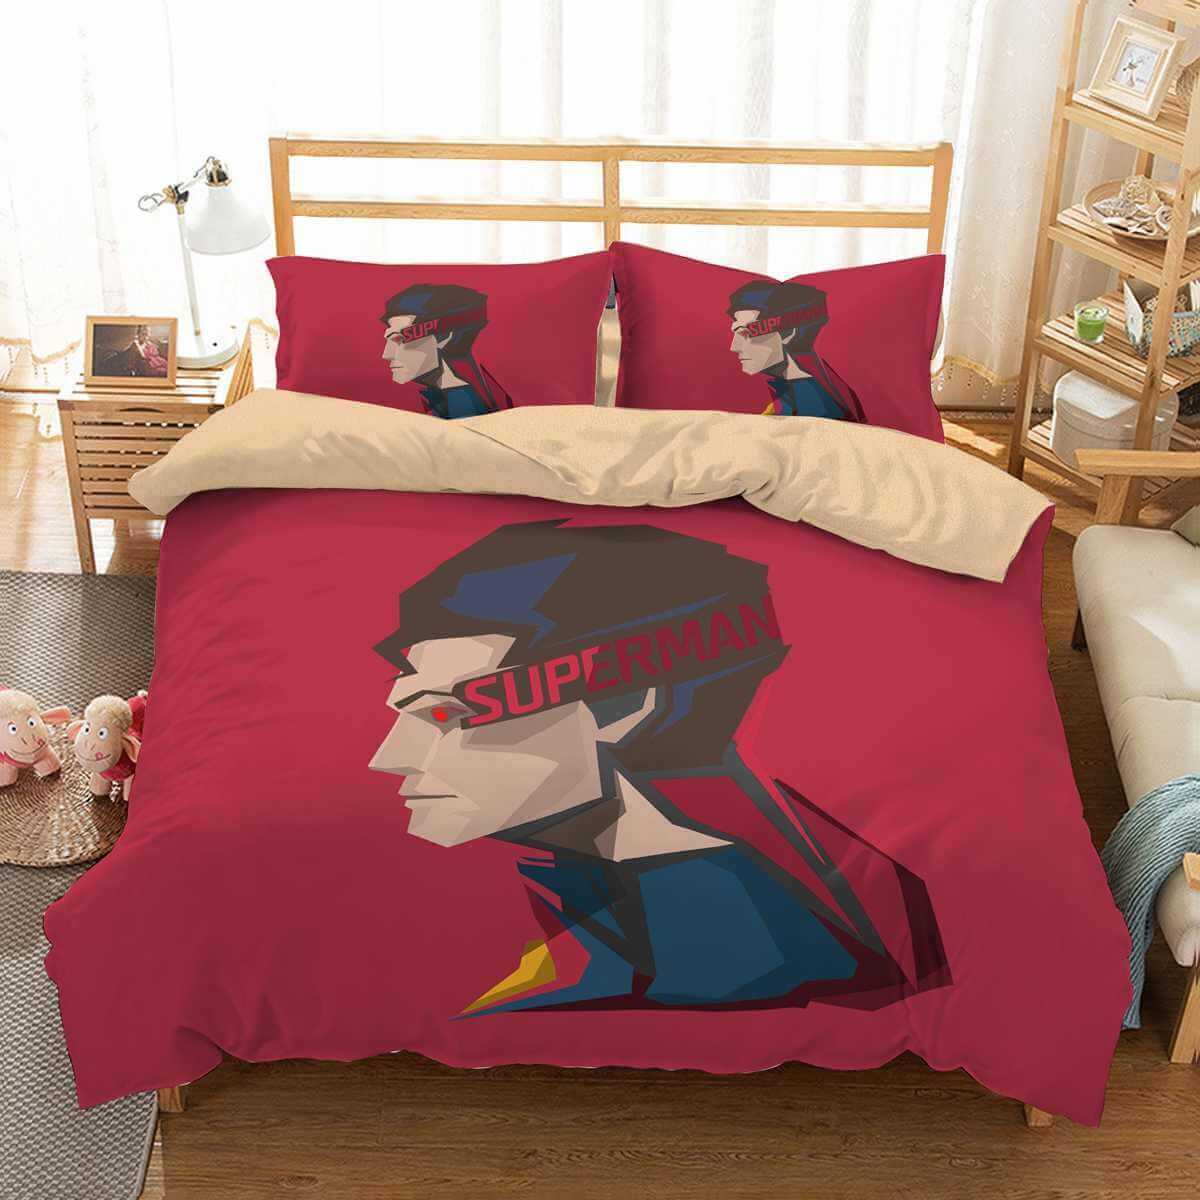 3d Customize Superman Bedding Set Duvet Cover Set Bedroom Set